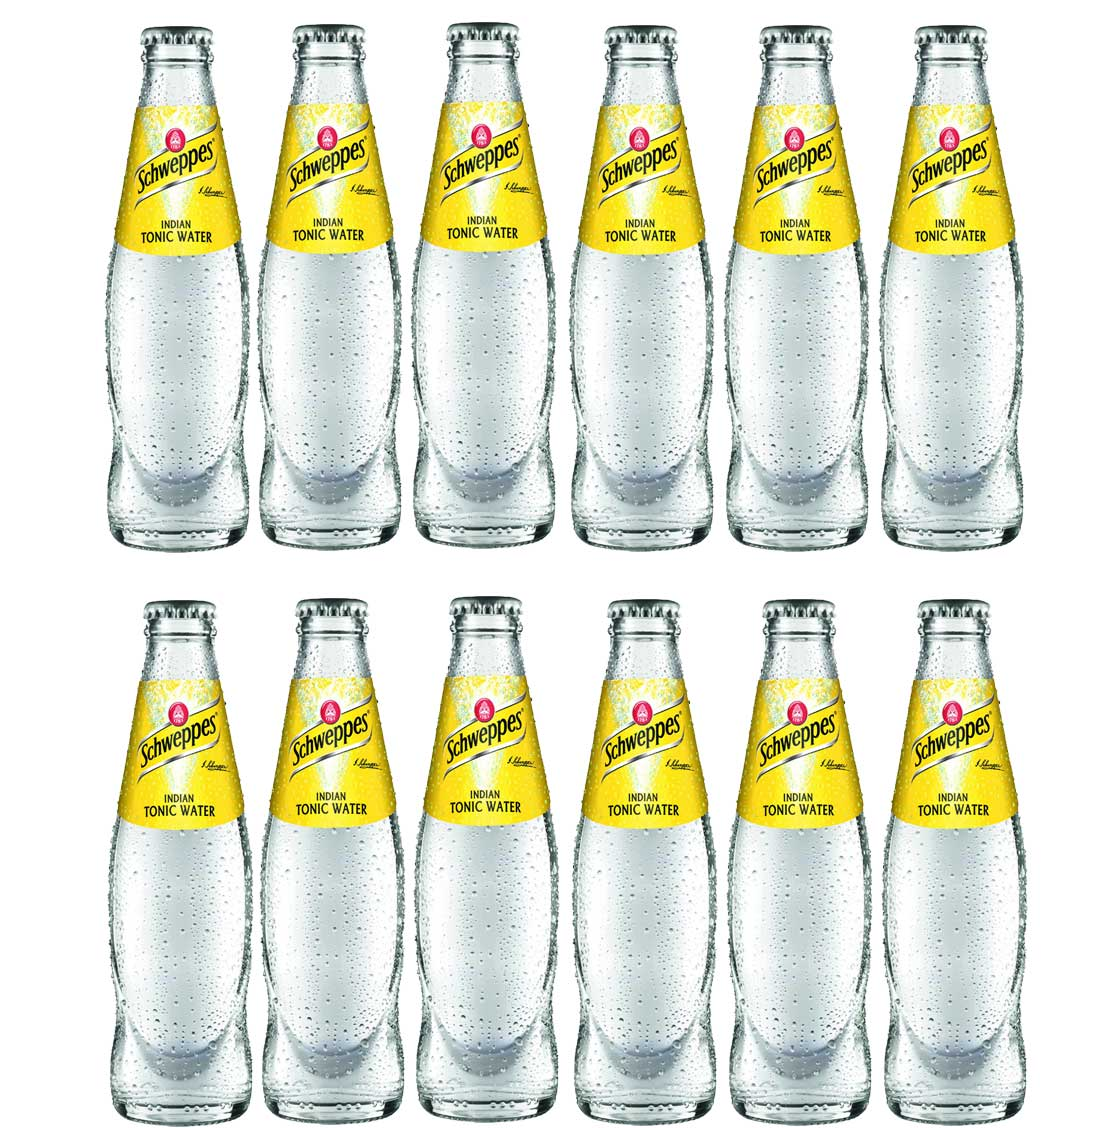 Schweppes Indian Tonic Water 12er Set 200ml inkl. Pfand MEHRWEG